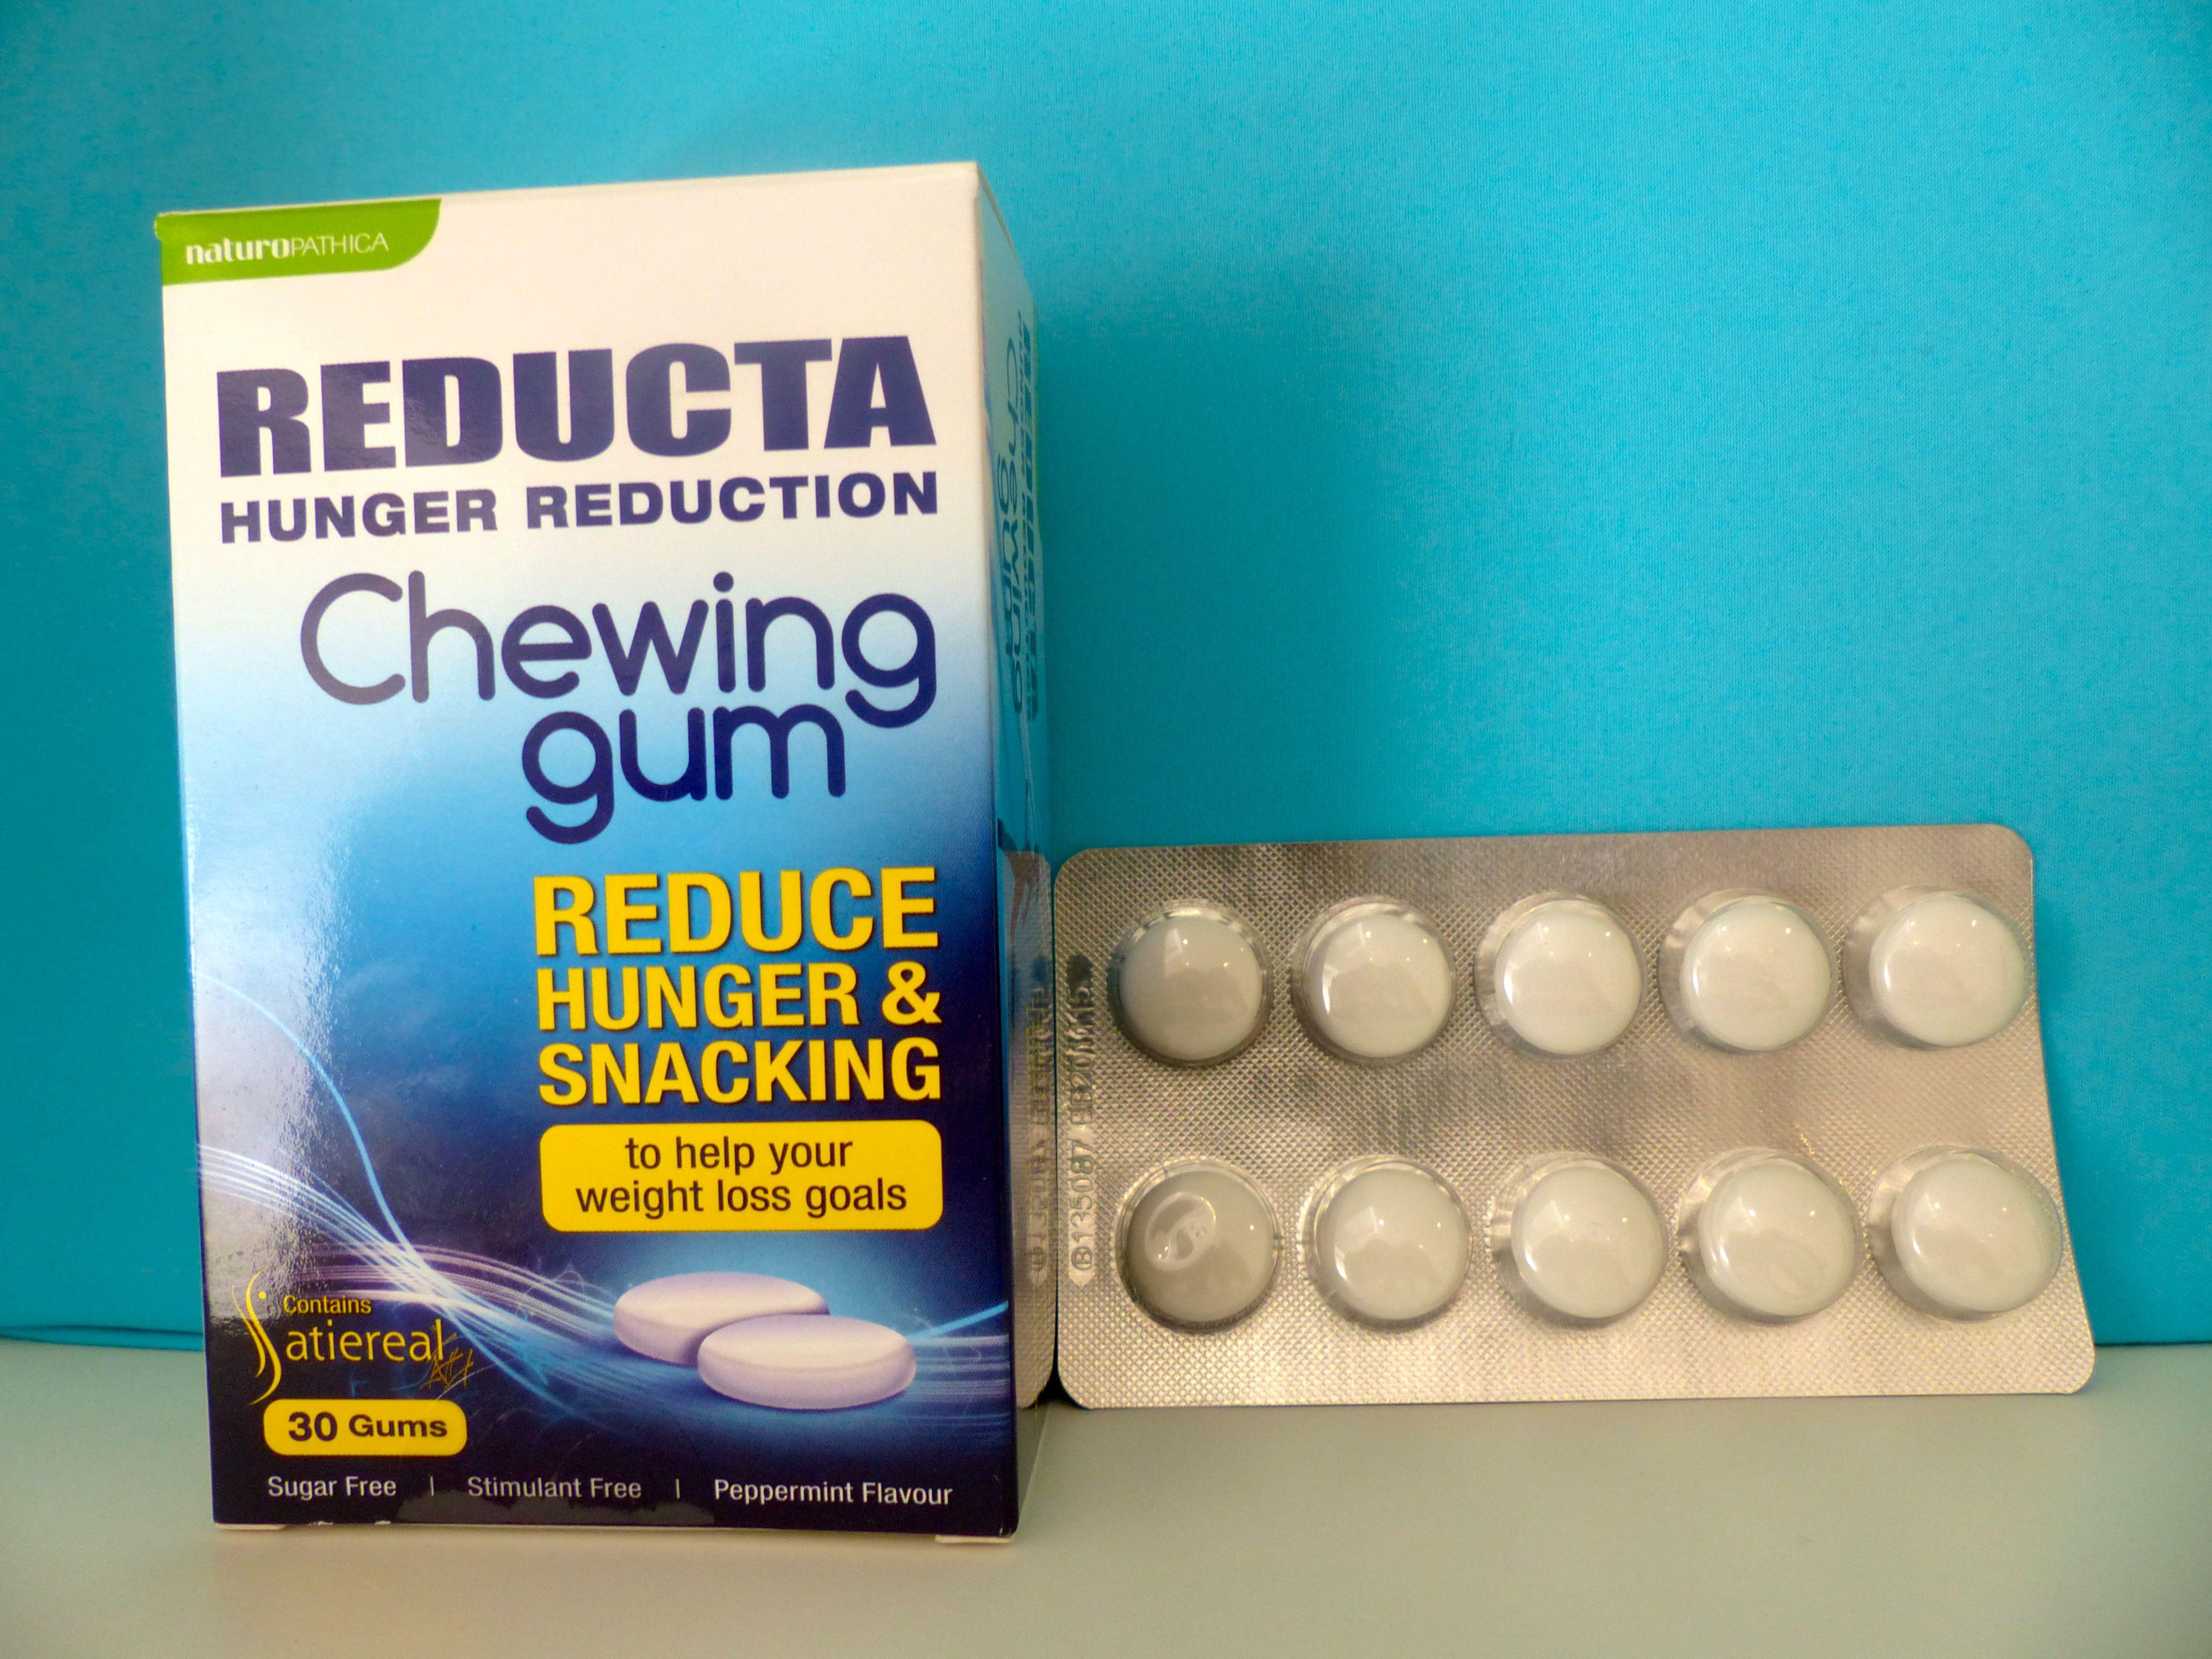 Reducta Chewing Gum